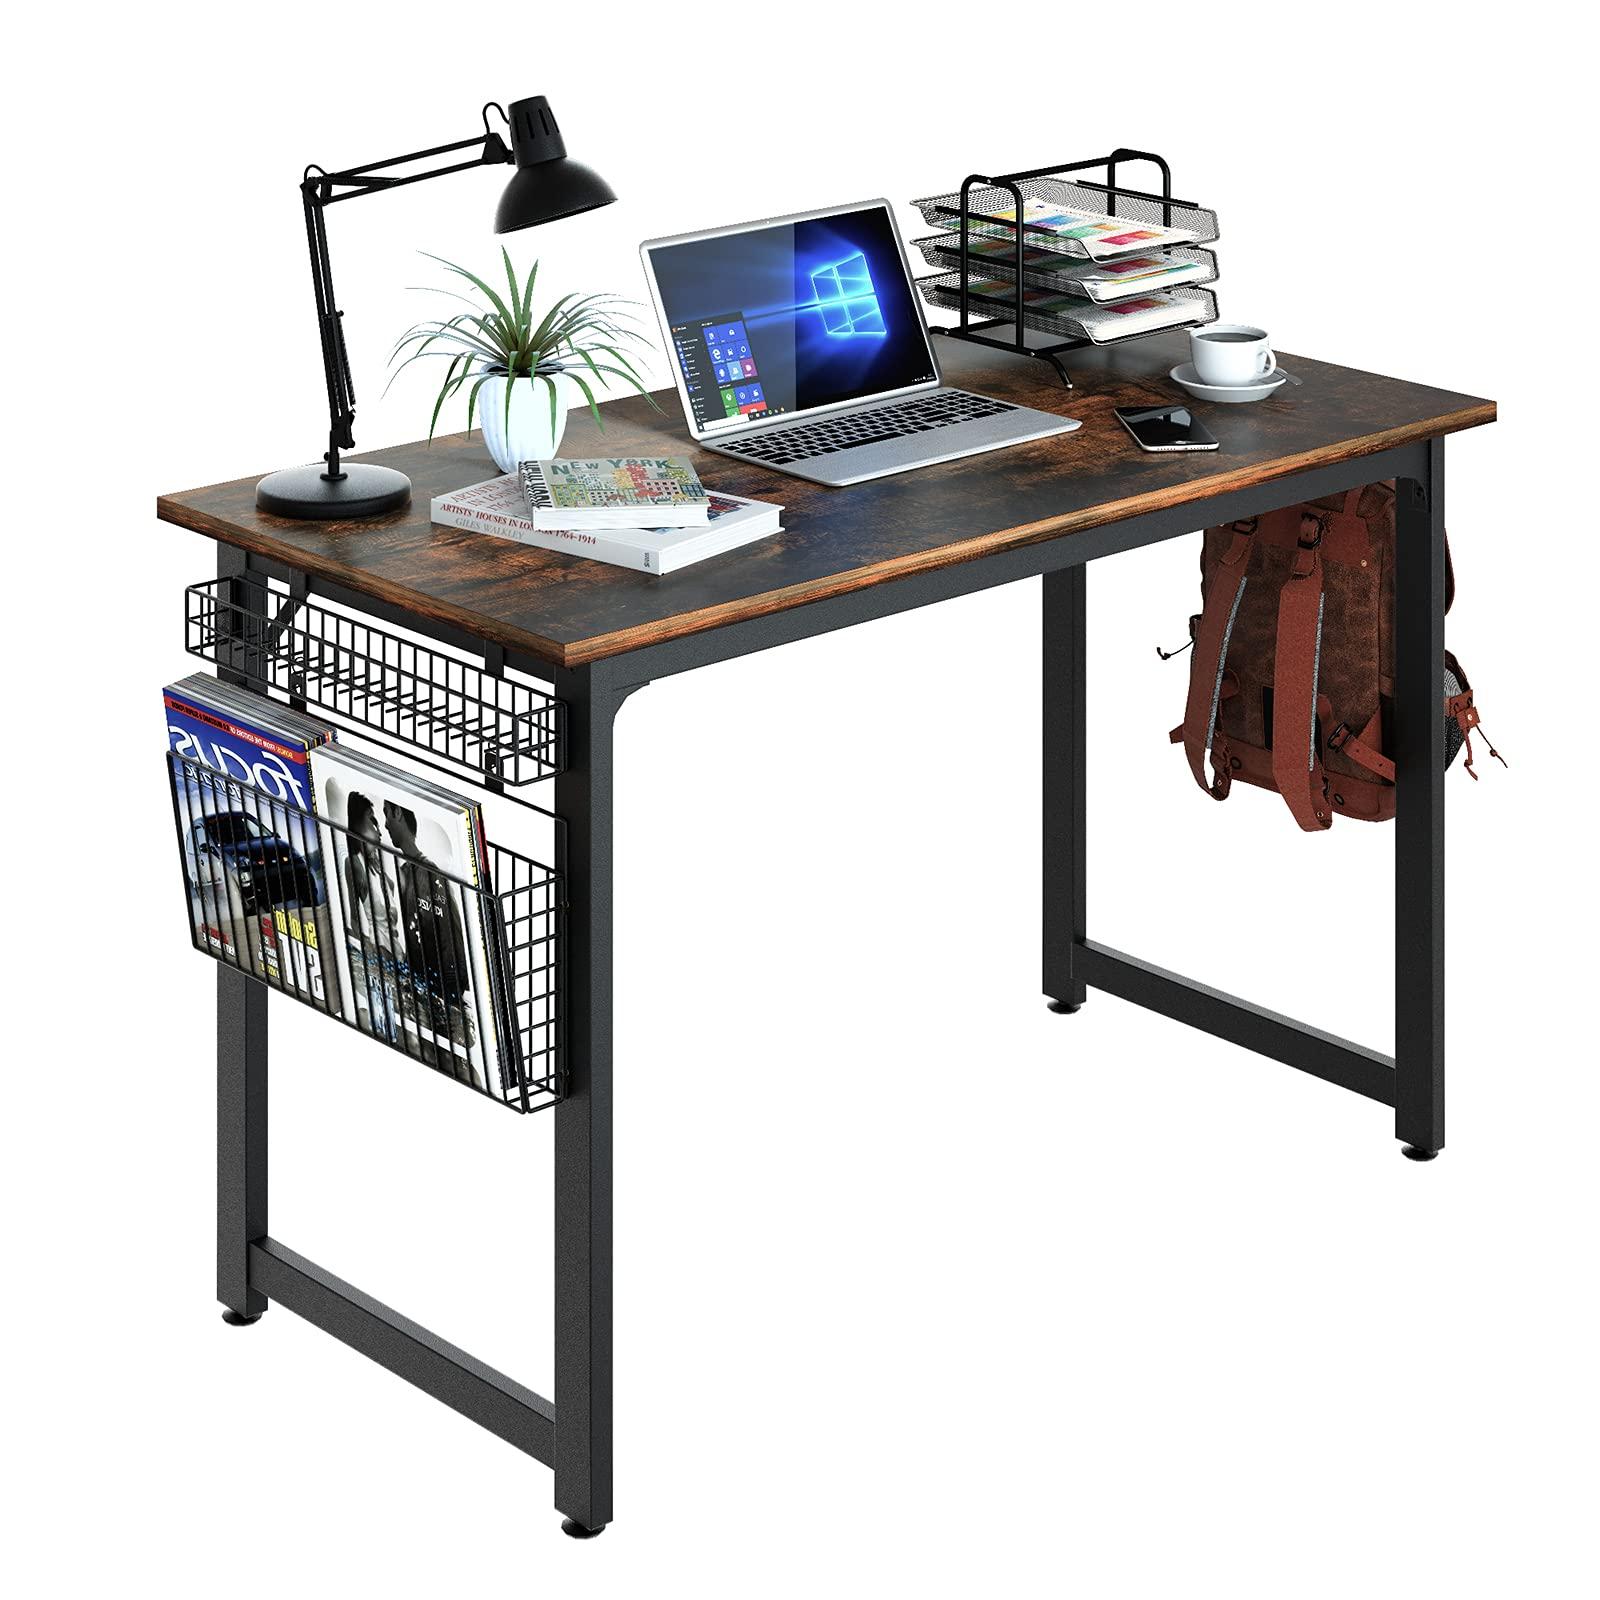 ASTARTH Study Computer Desk 39 Inch Home Office Desk Wood Storage Table